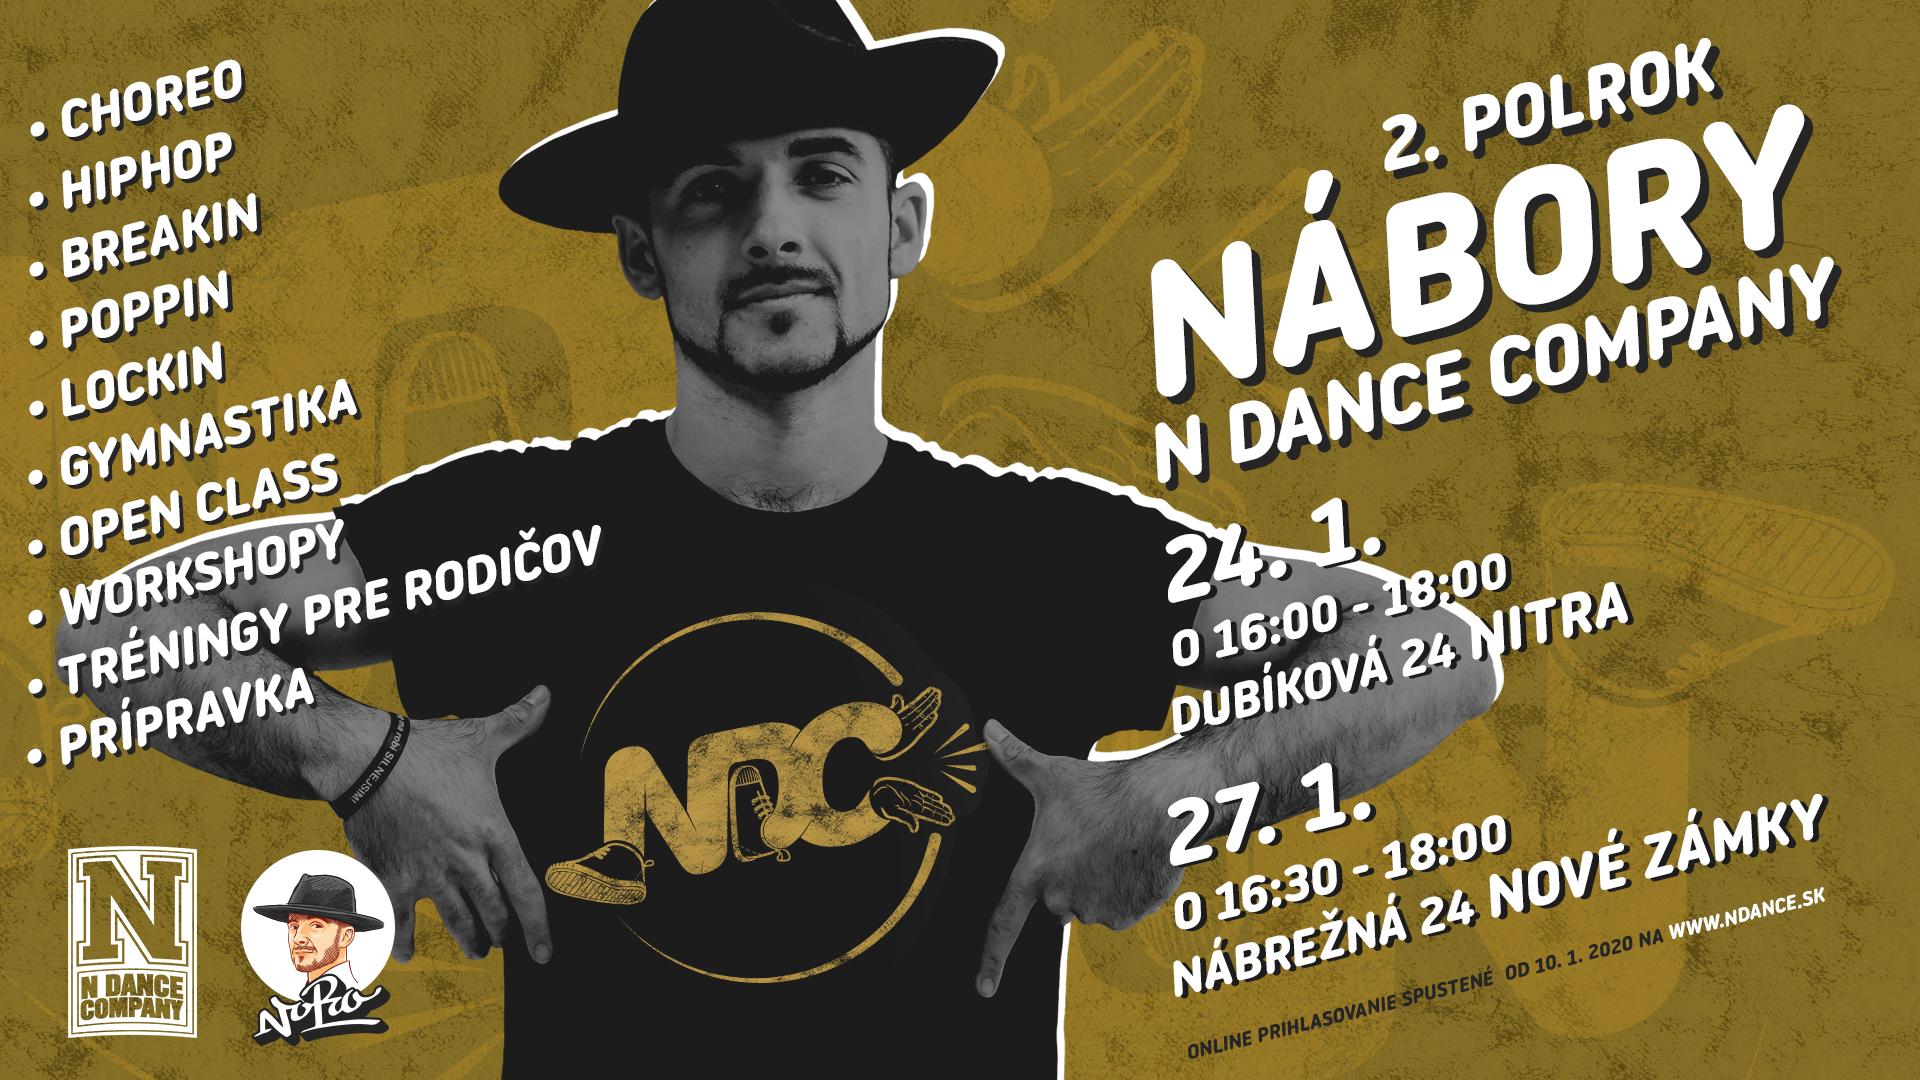 Ndance_noro_nabory_2_polrok_2020_slider